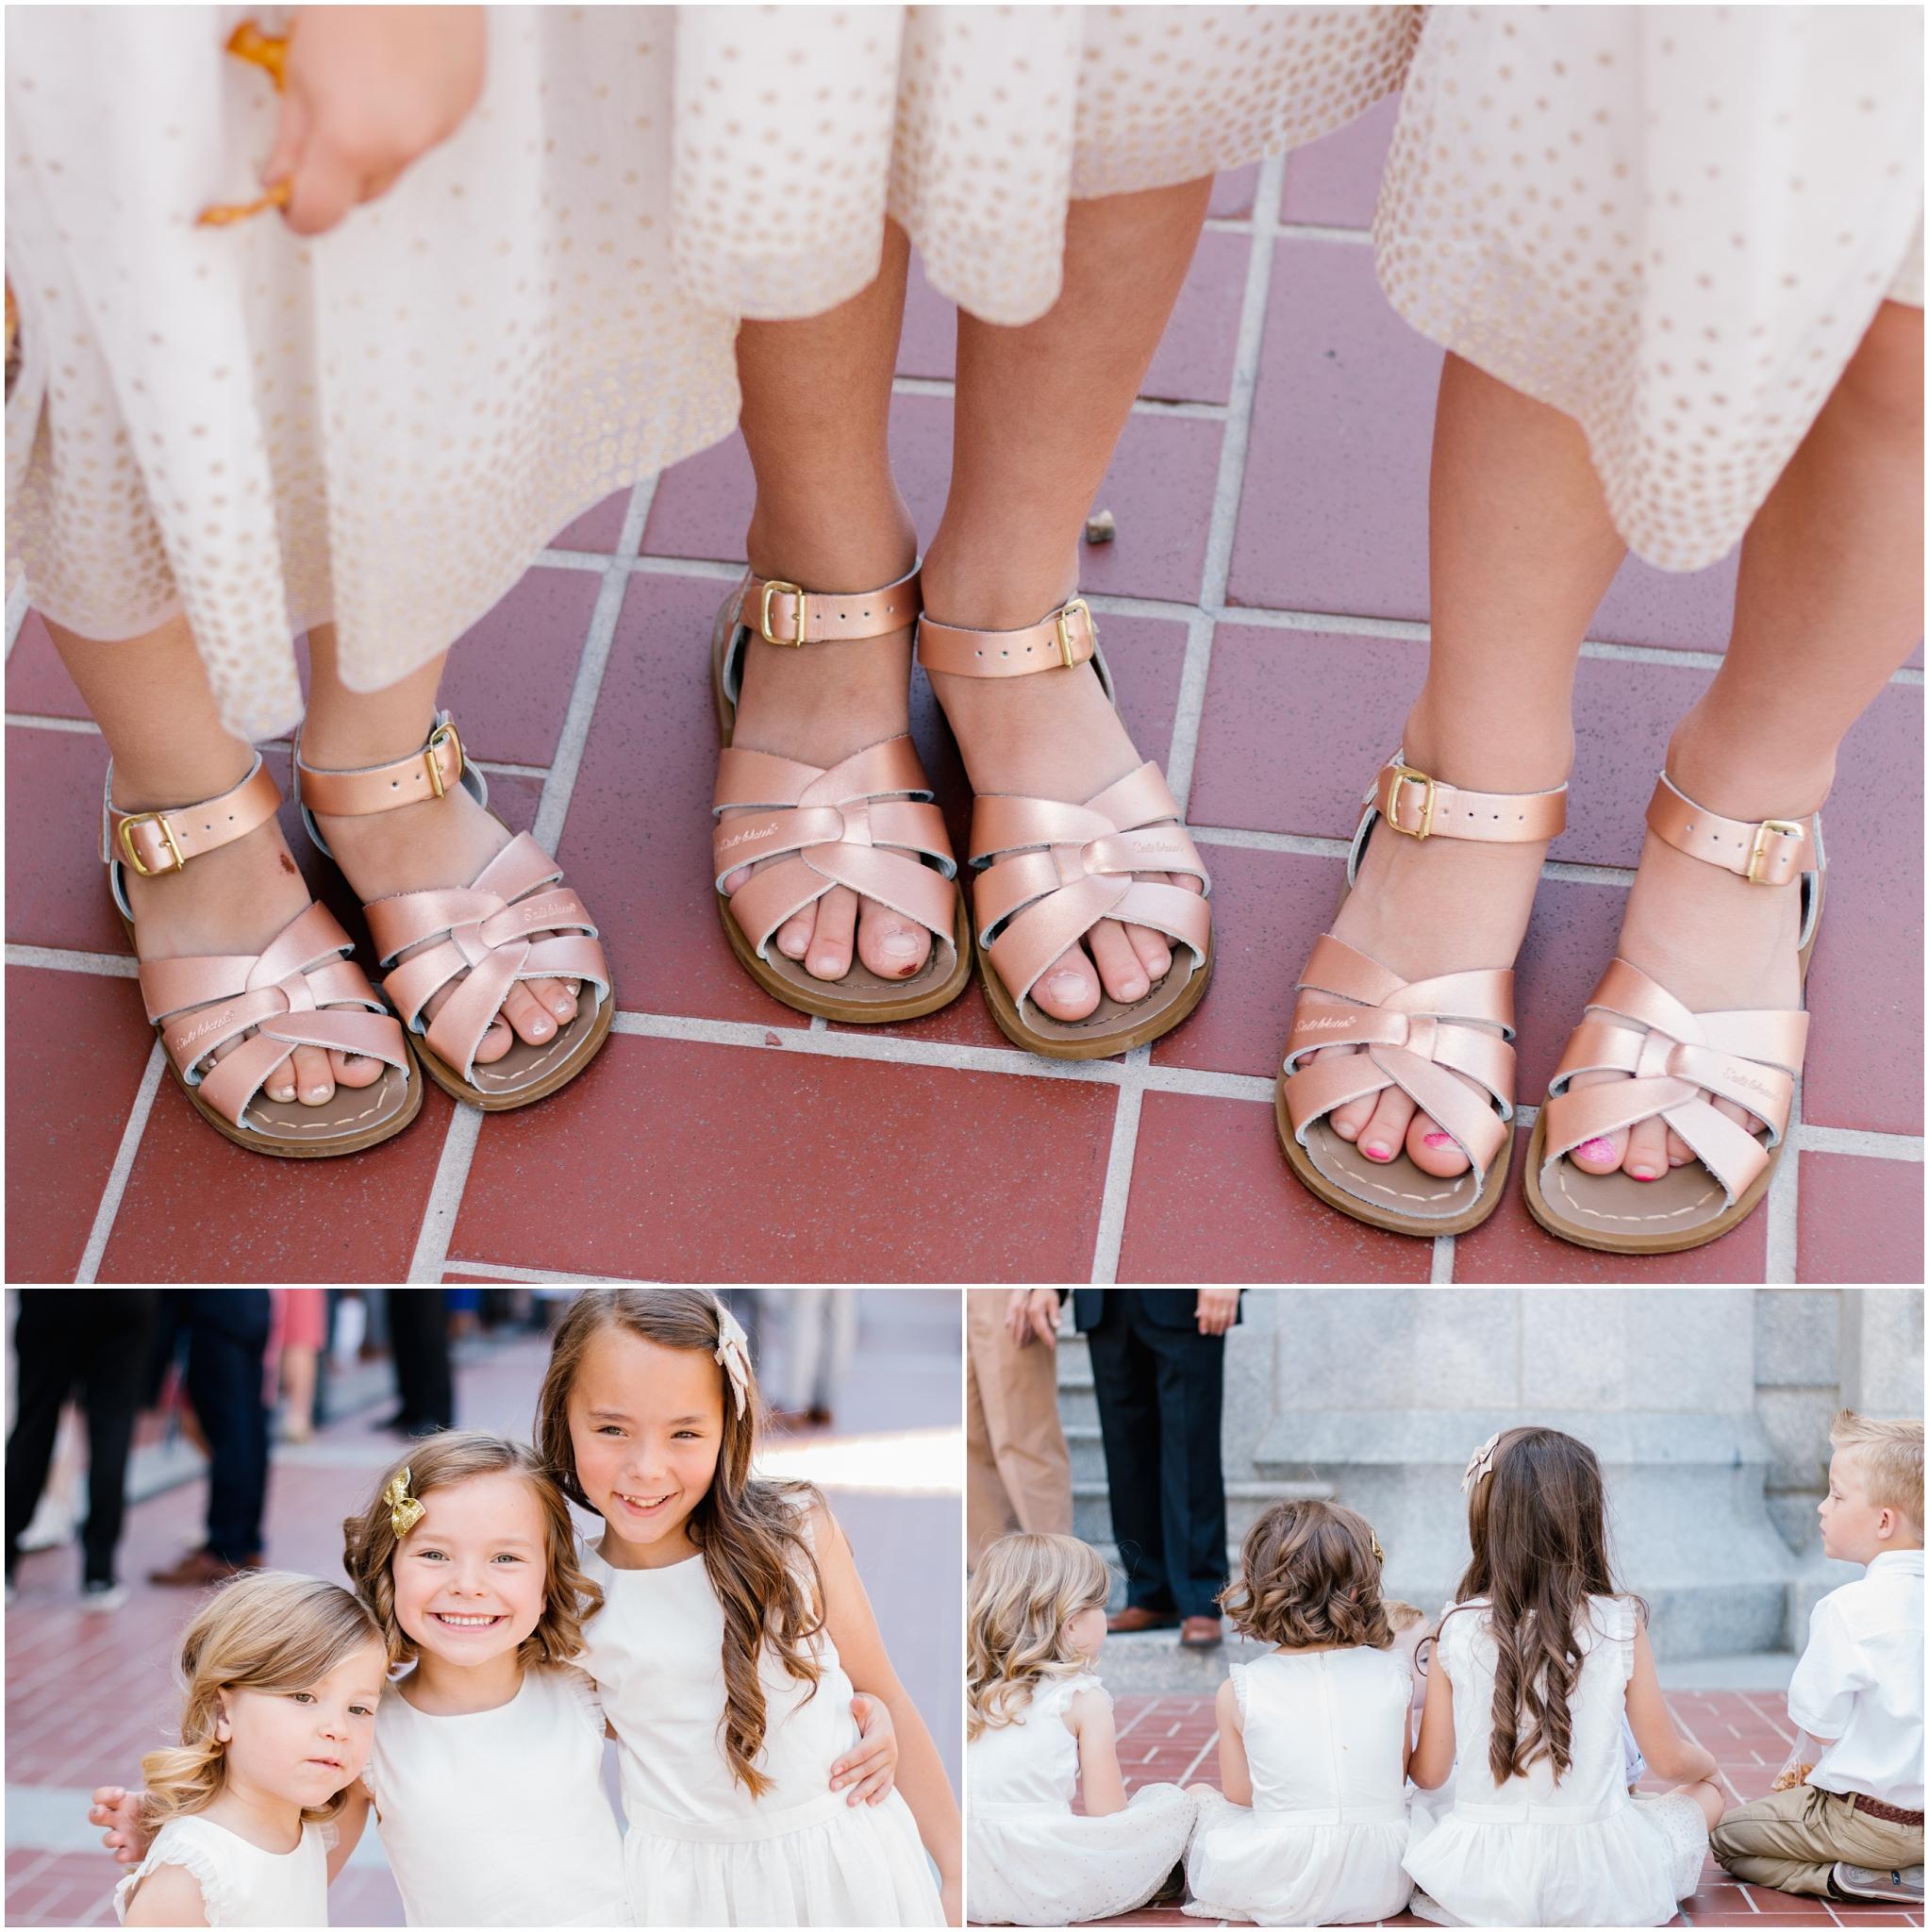 CherylandTyler-119-2_Lizzie-B-Imagery-Utah-Wedding-Photographer-Salt-Lake-City-Temple-Wells-Fargo-Building-Reception.jpg